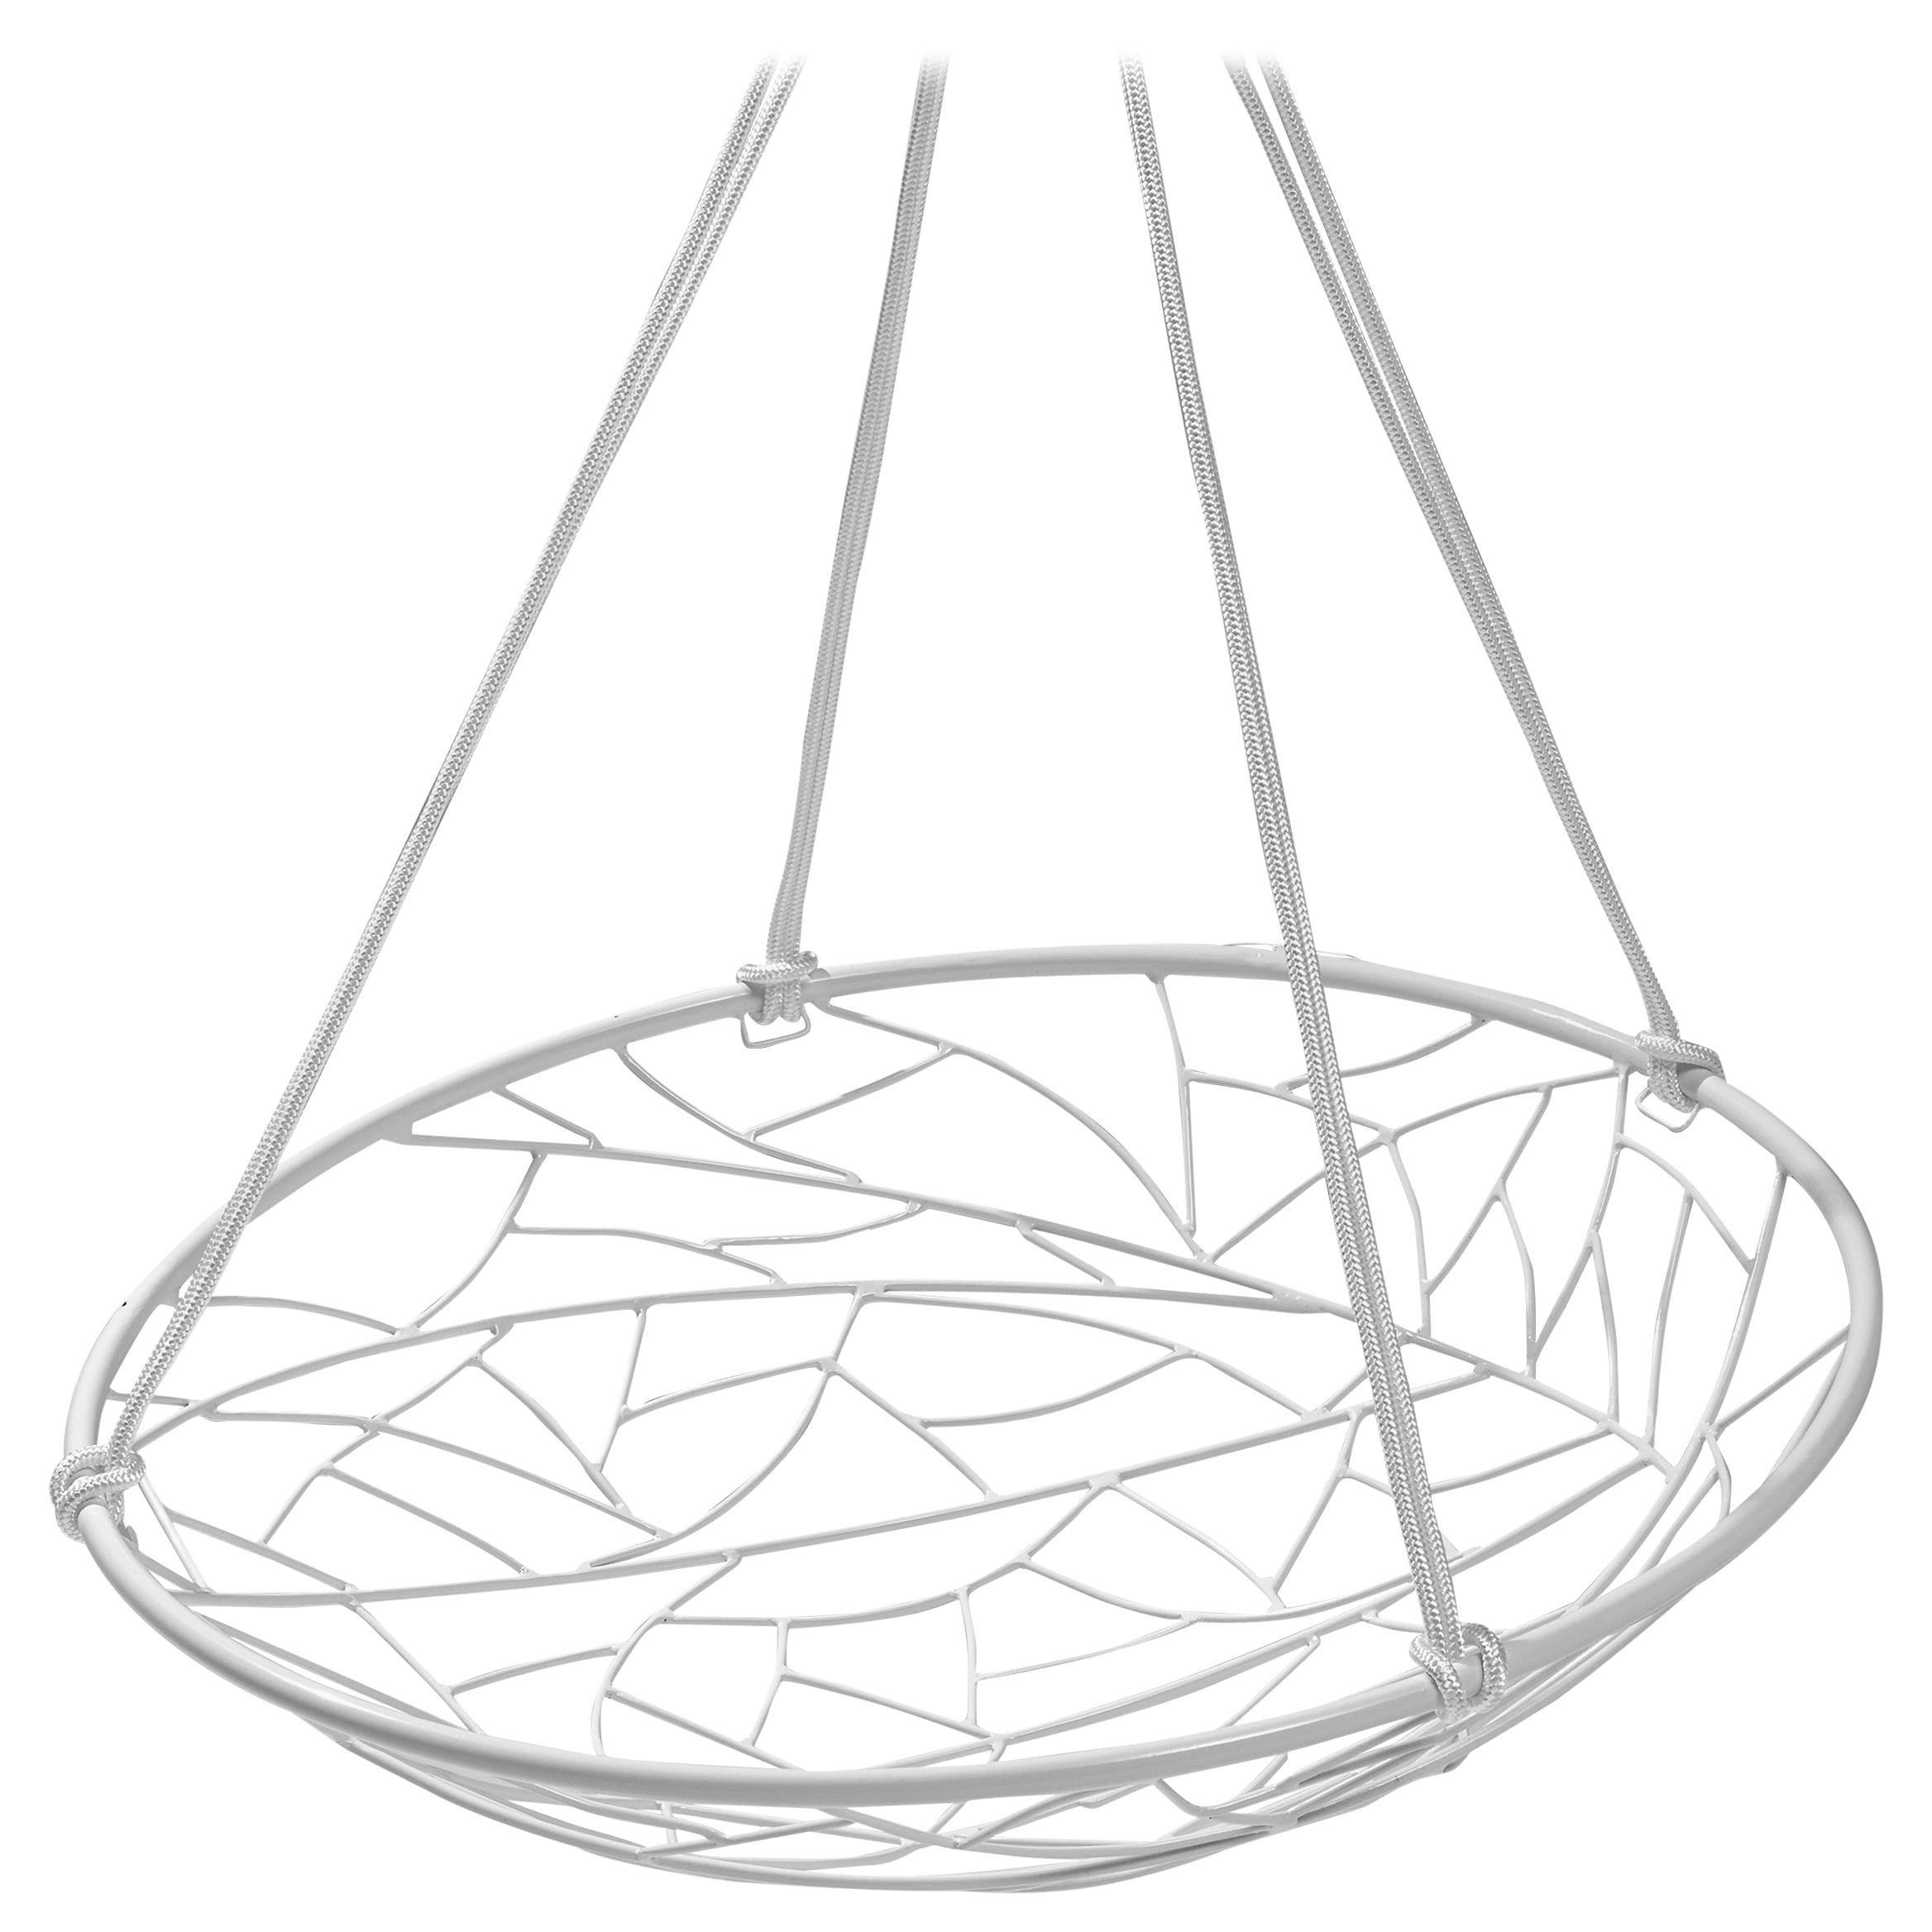 Basket Hanging Swing Chair Modern Steel Twig In/Outdoor White